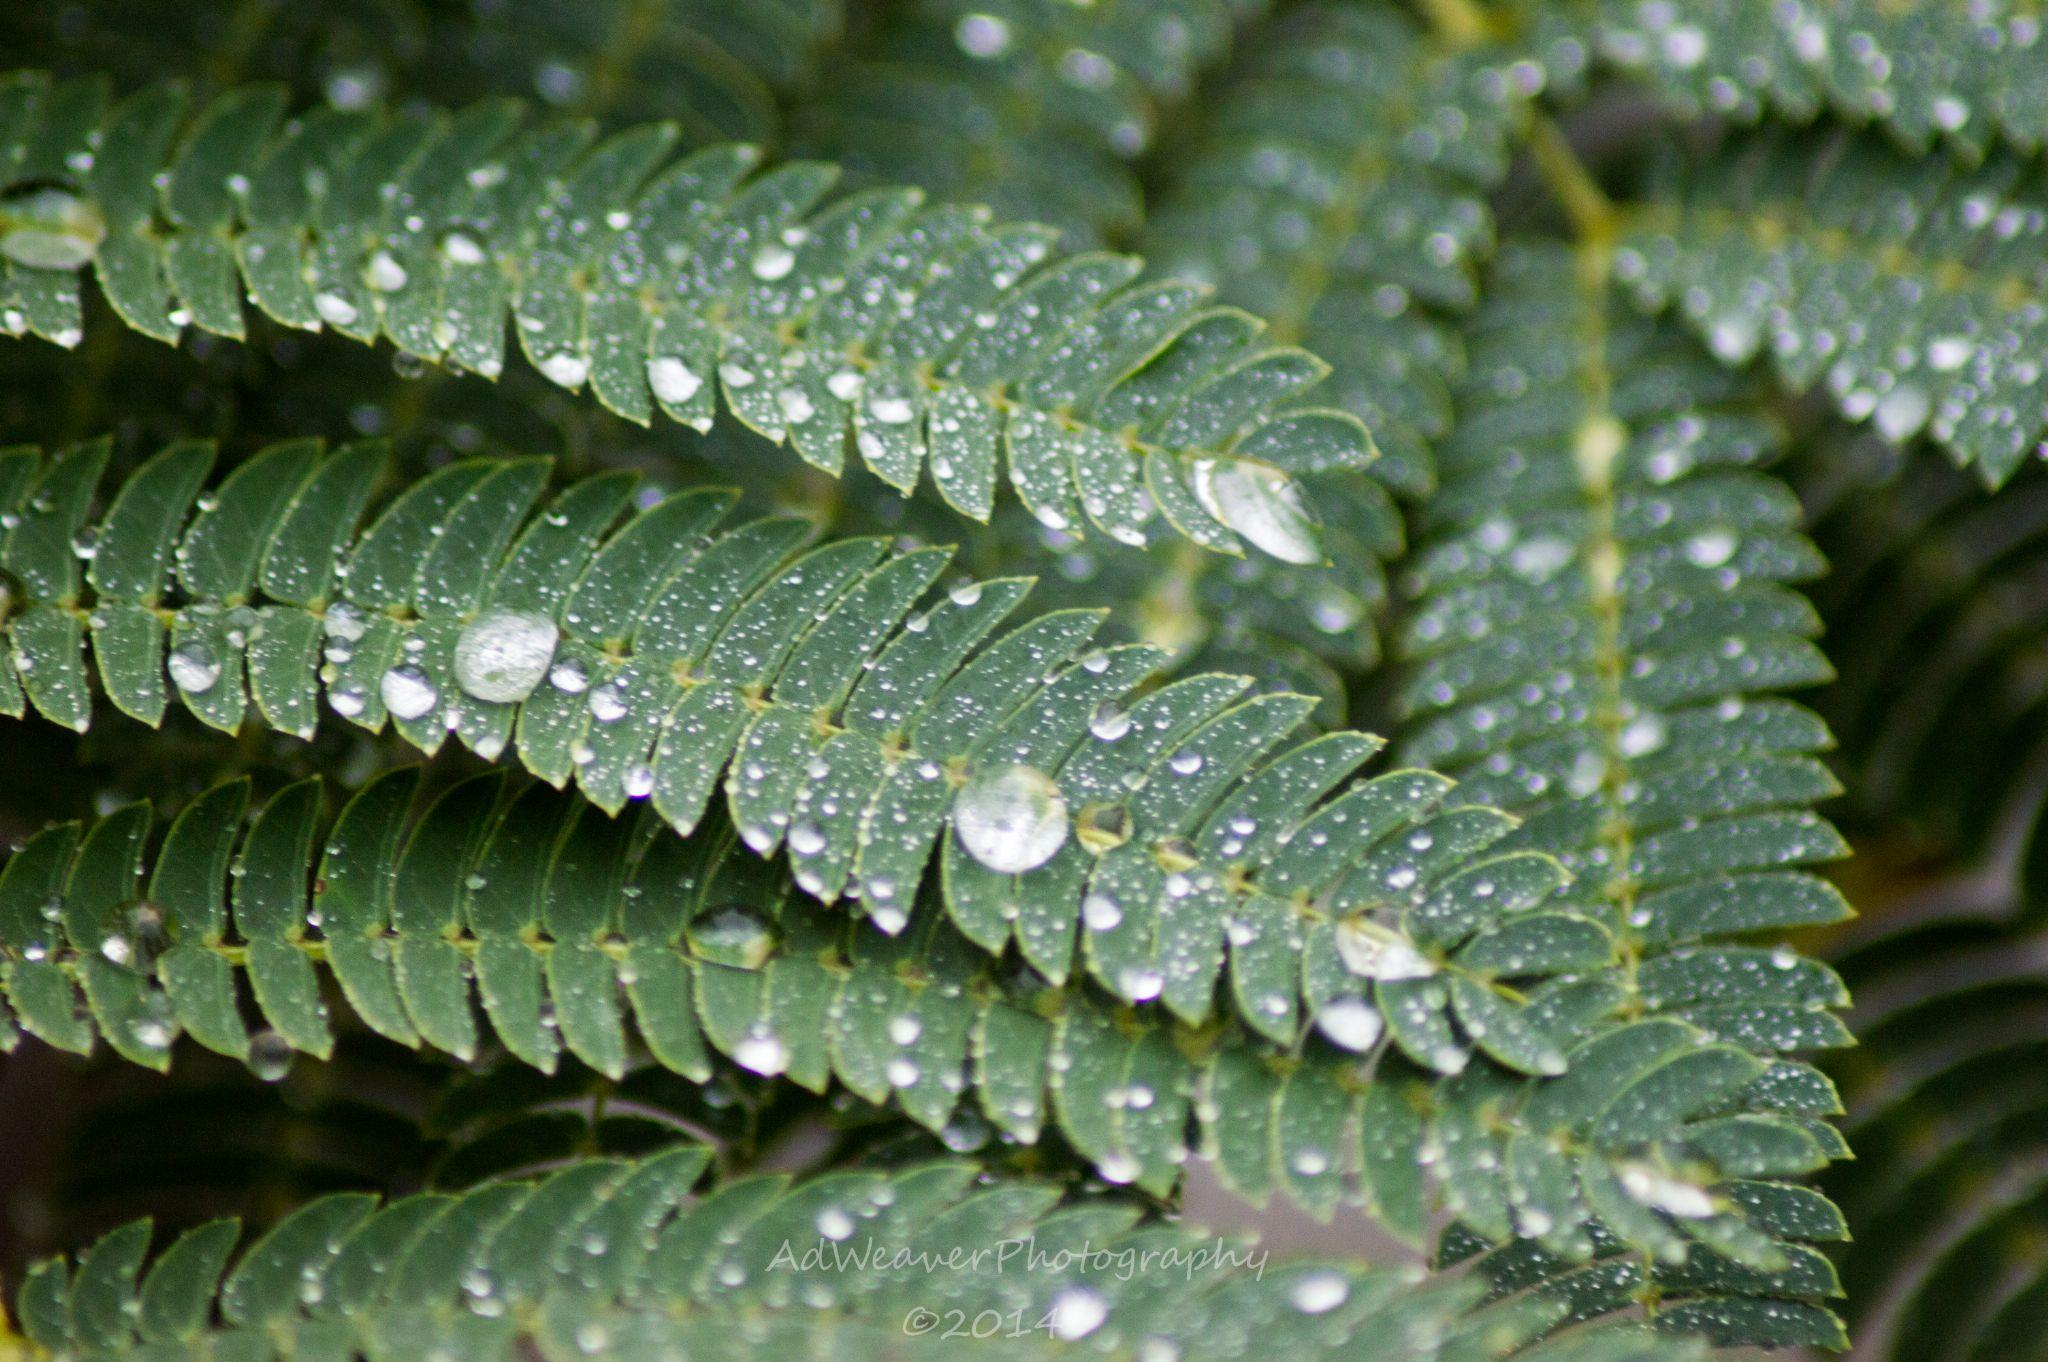 Raindrops by Danielle Weaver